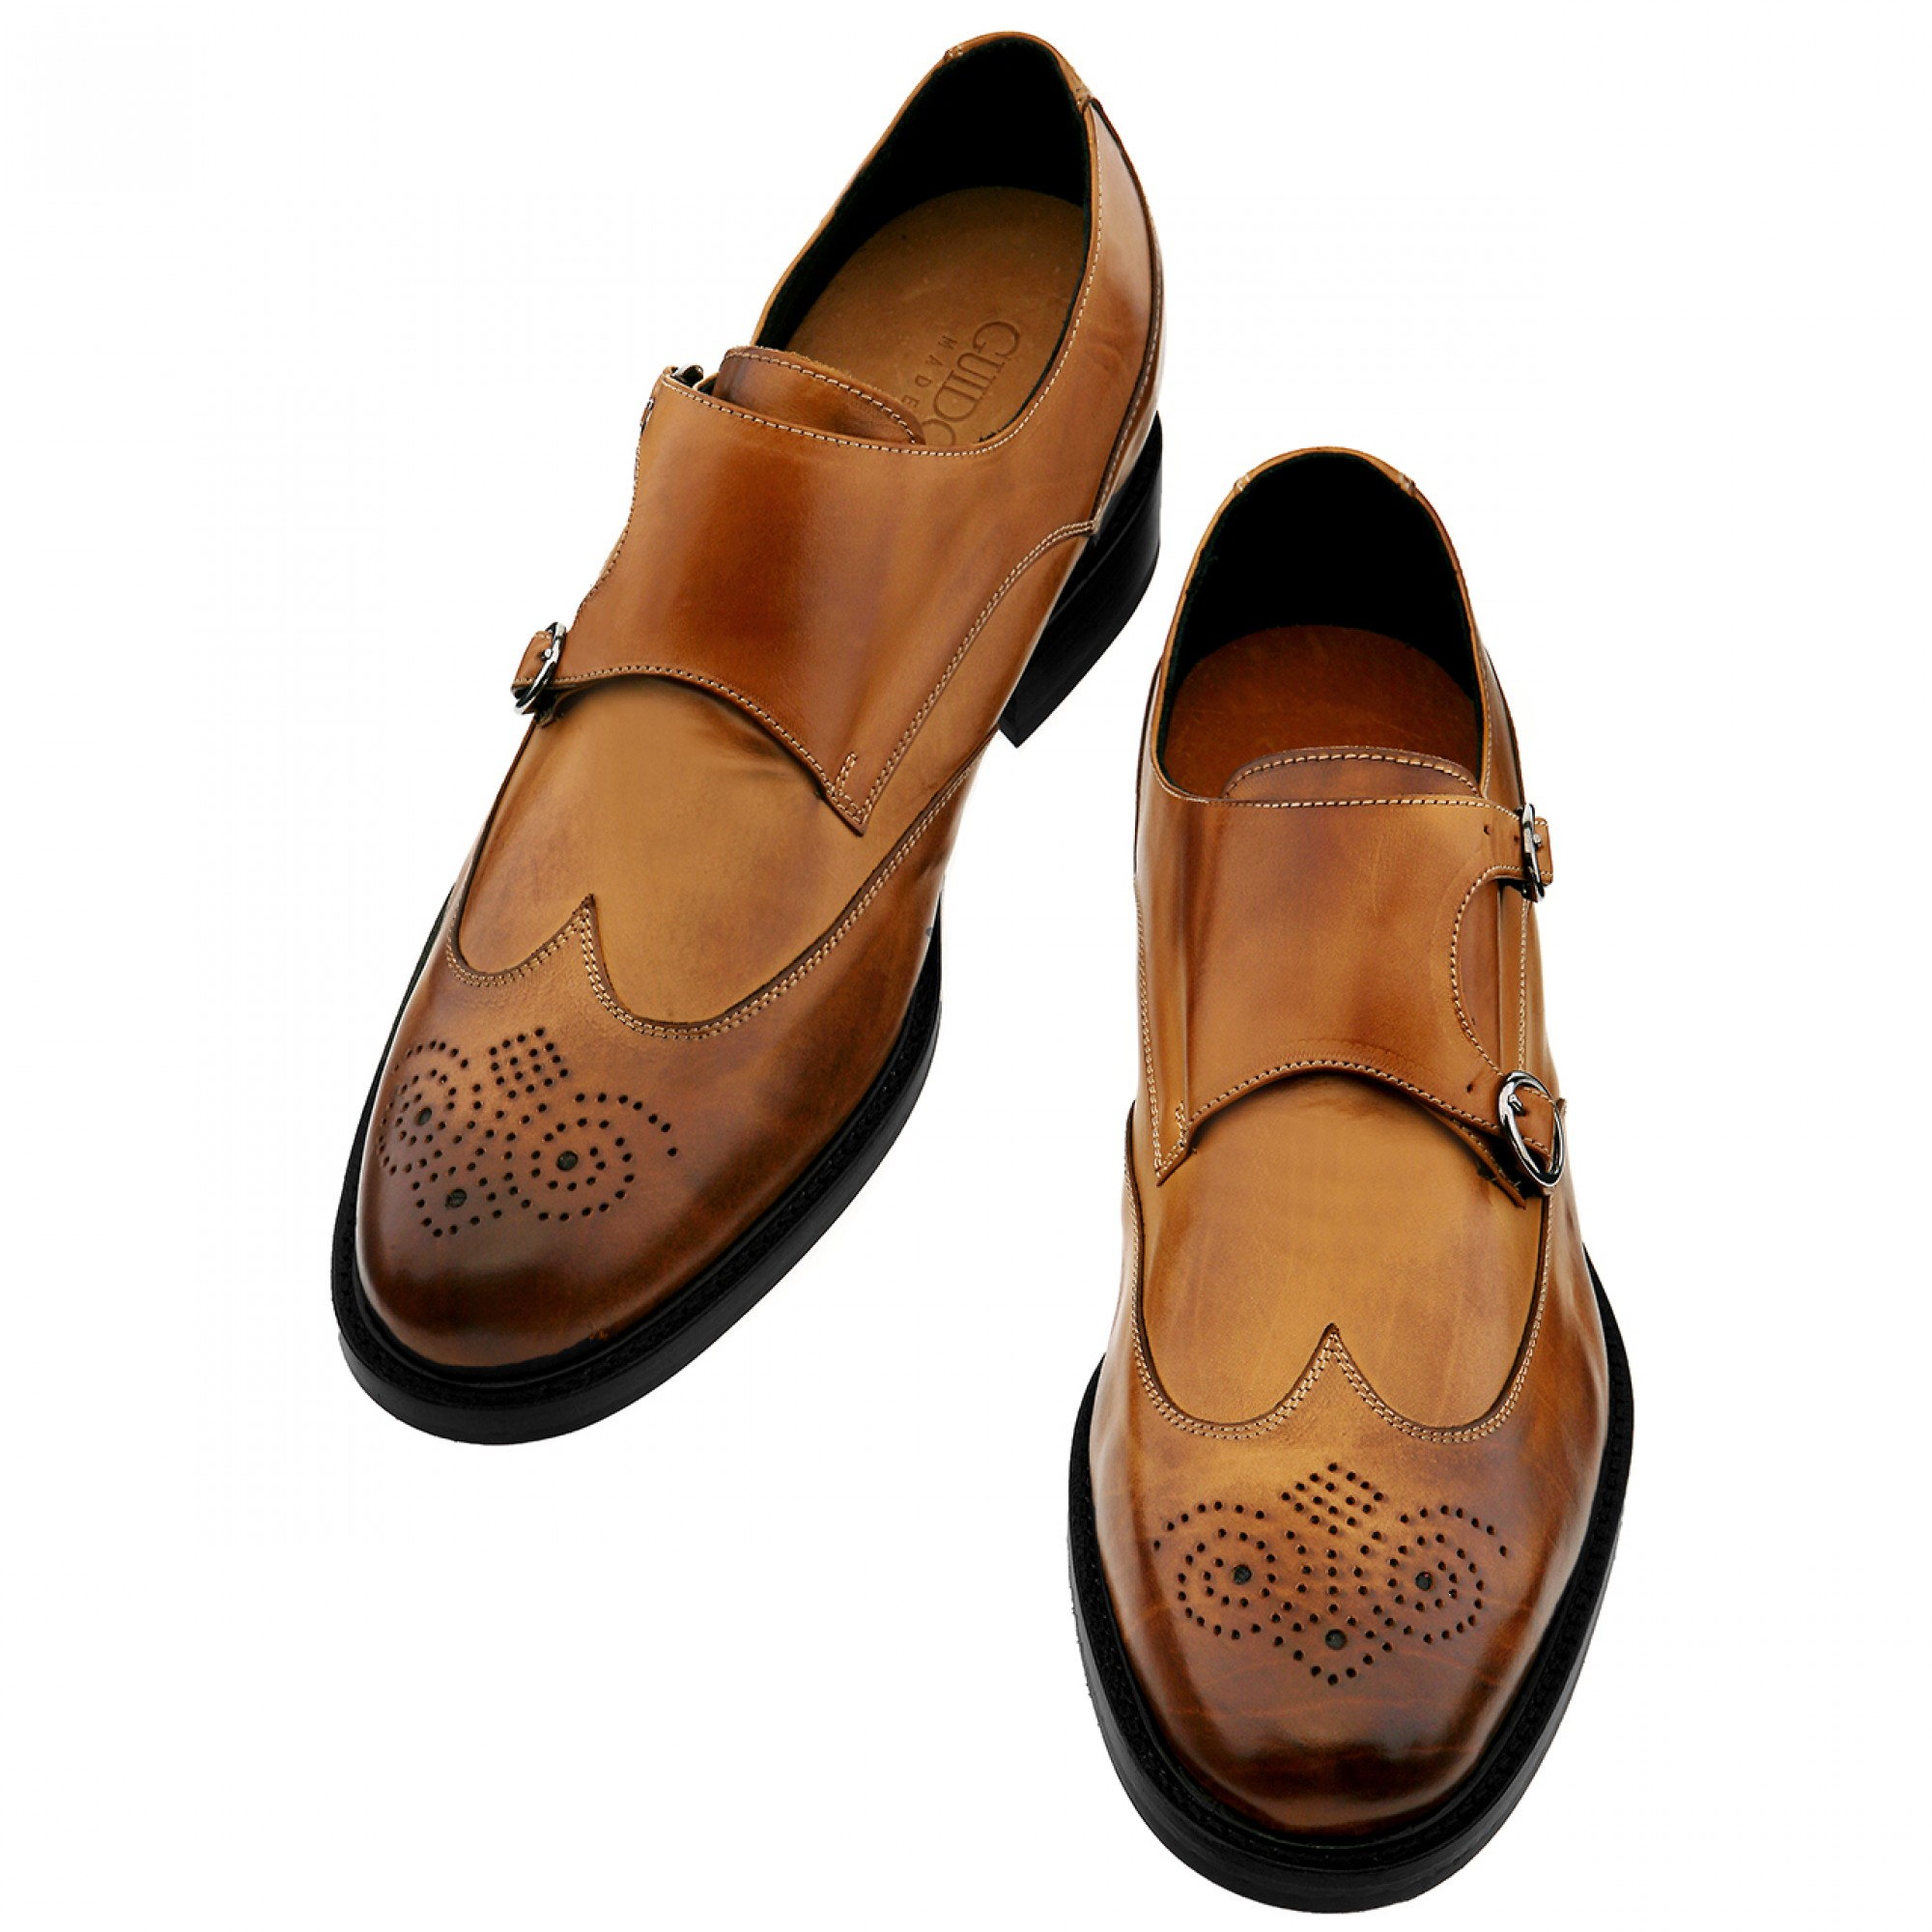 scarpe rialzate madison avenue